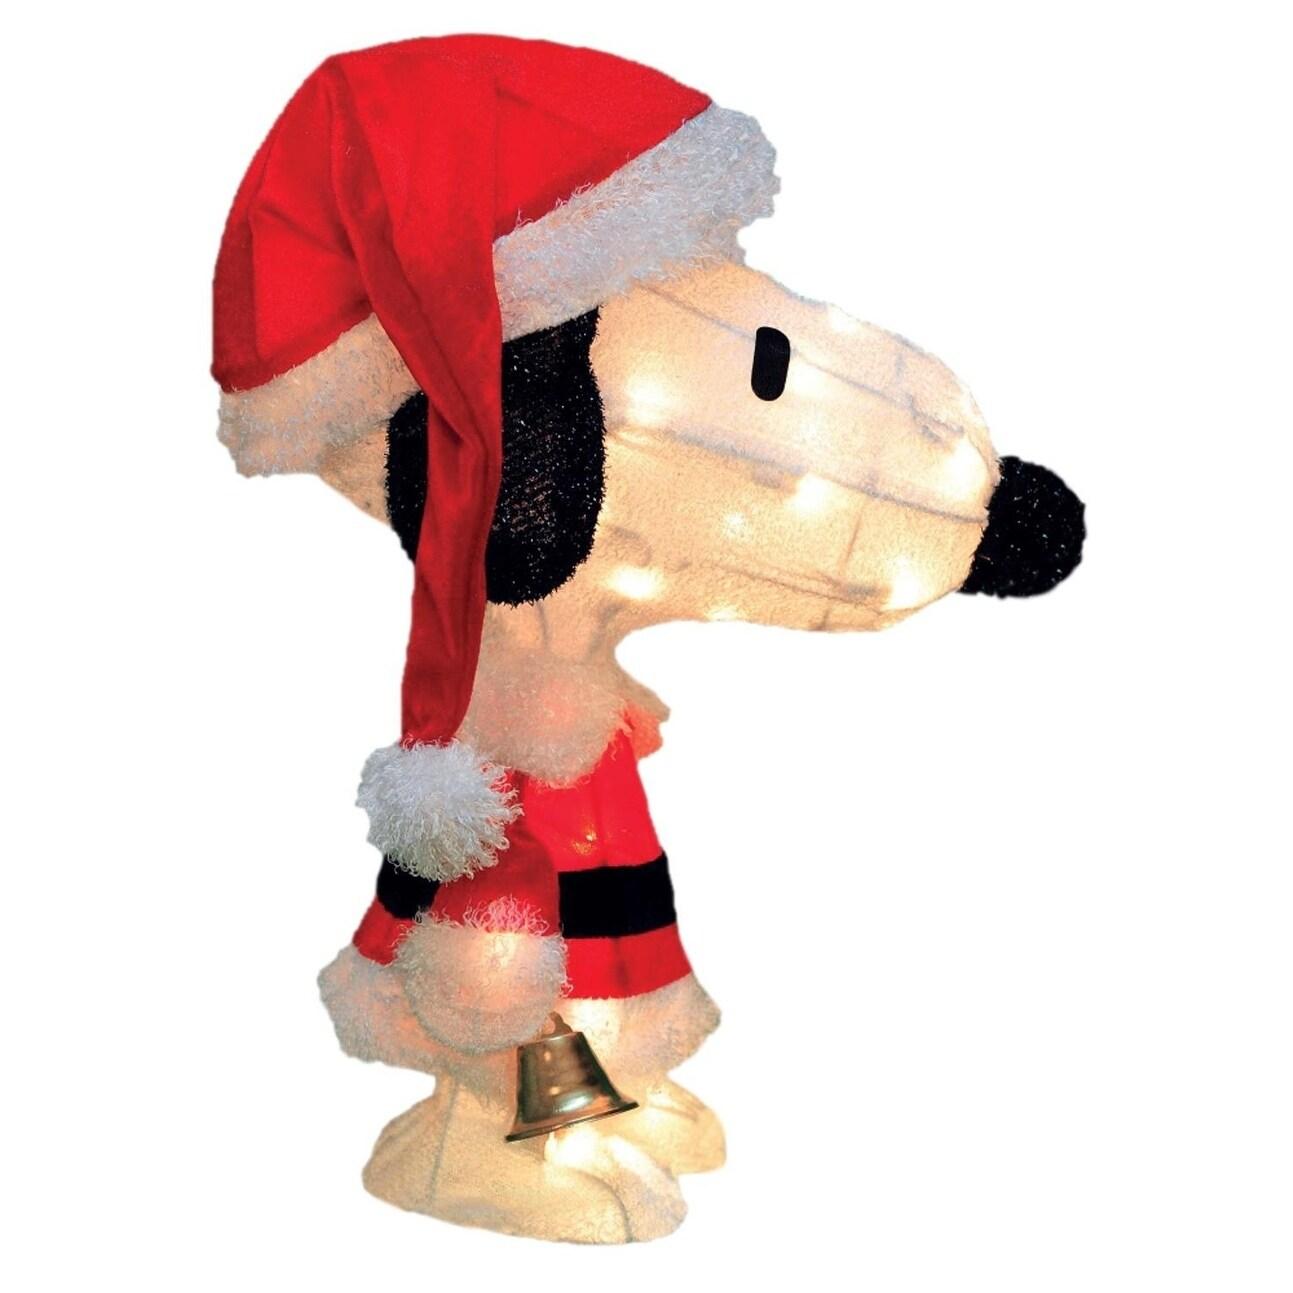 "Product Works 18"" Pre-Lit Peanuts Soft Tinsel Santa Claus..."